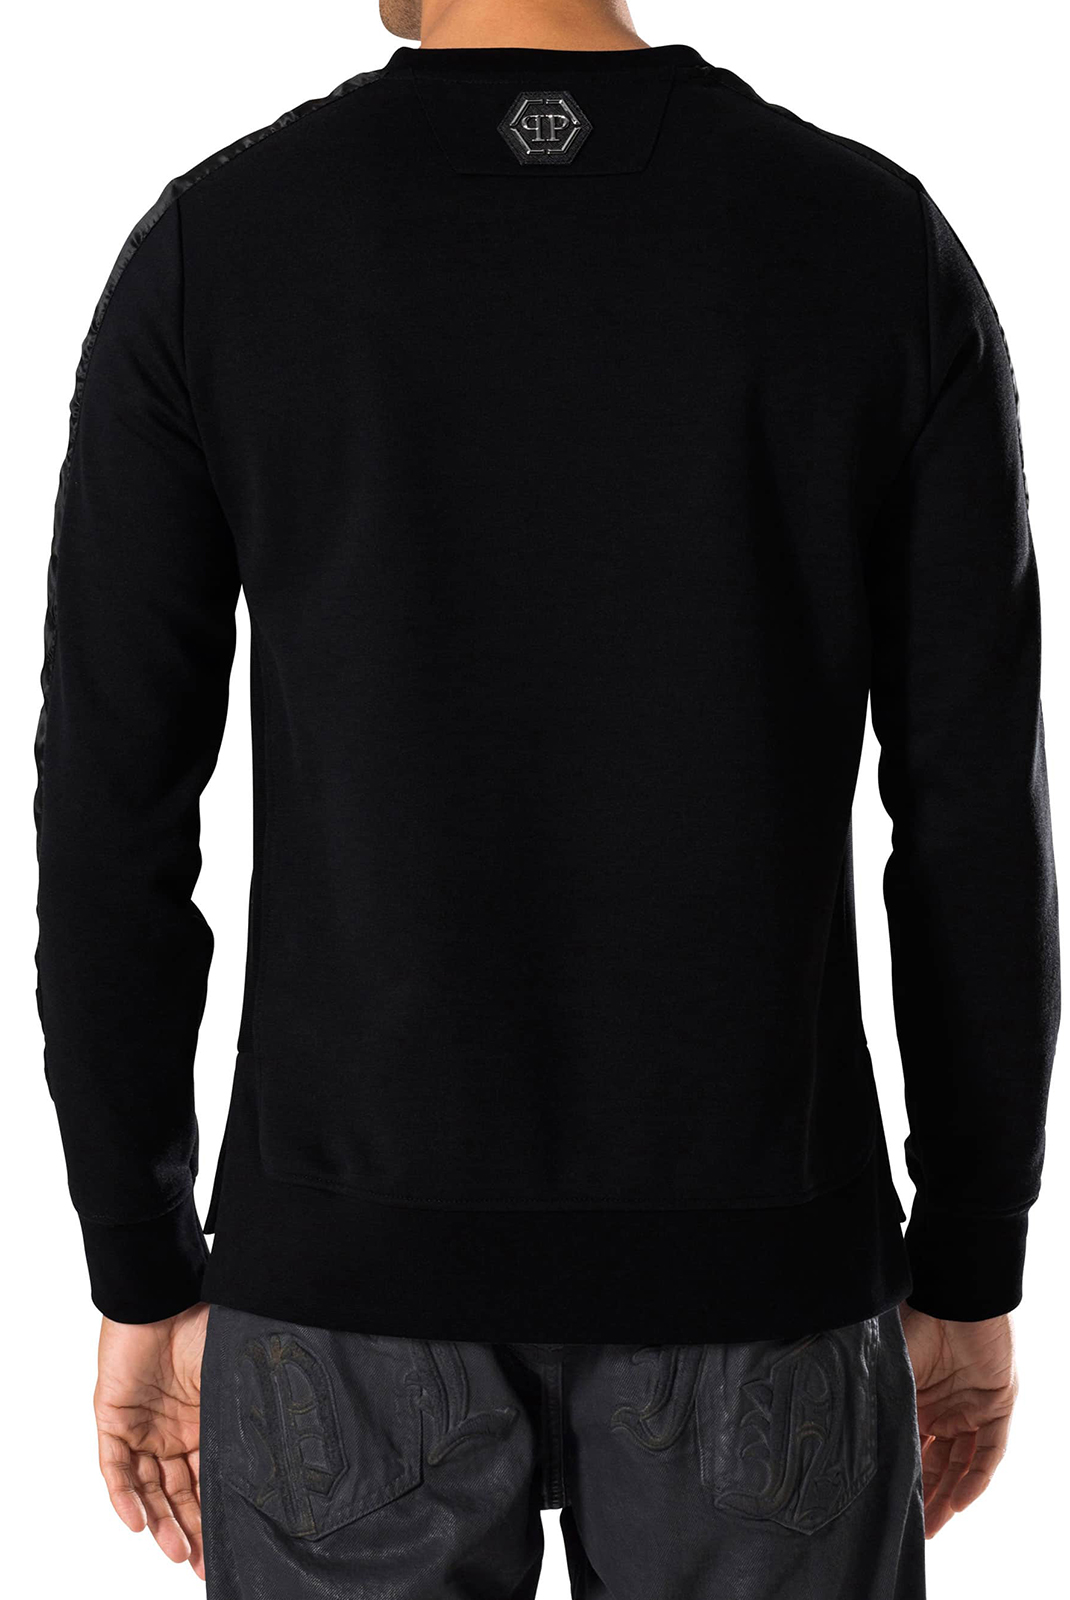 Sweatshirts  Philipp plein MJO0229 STAR OF NOIR